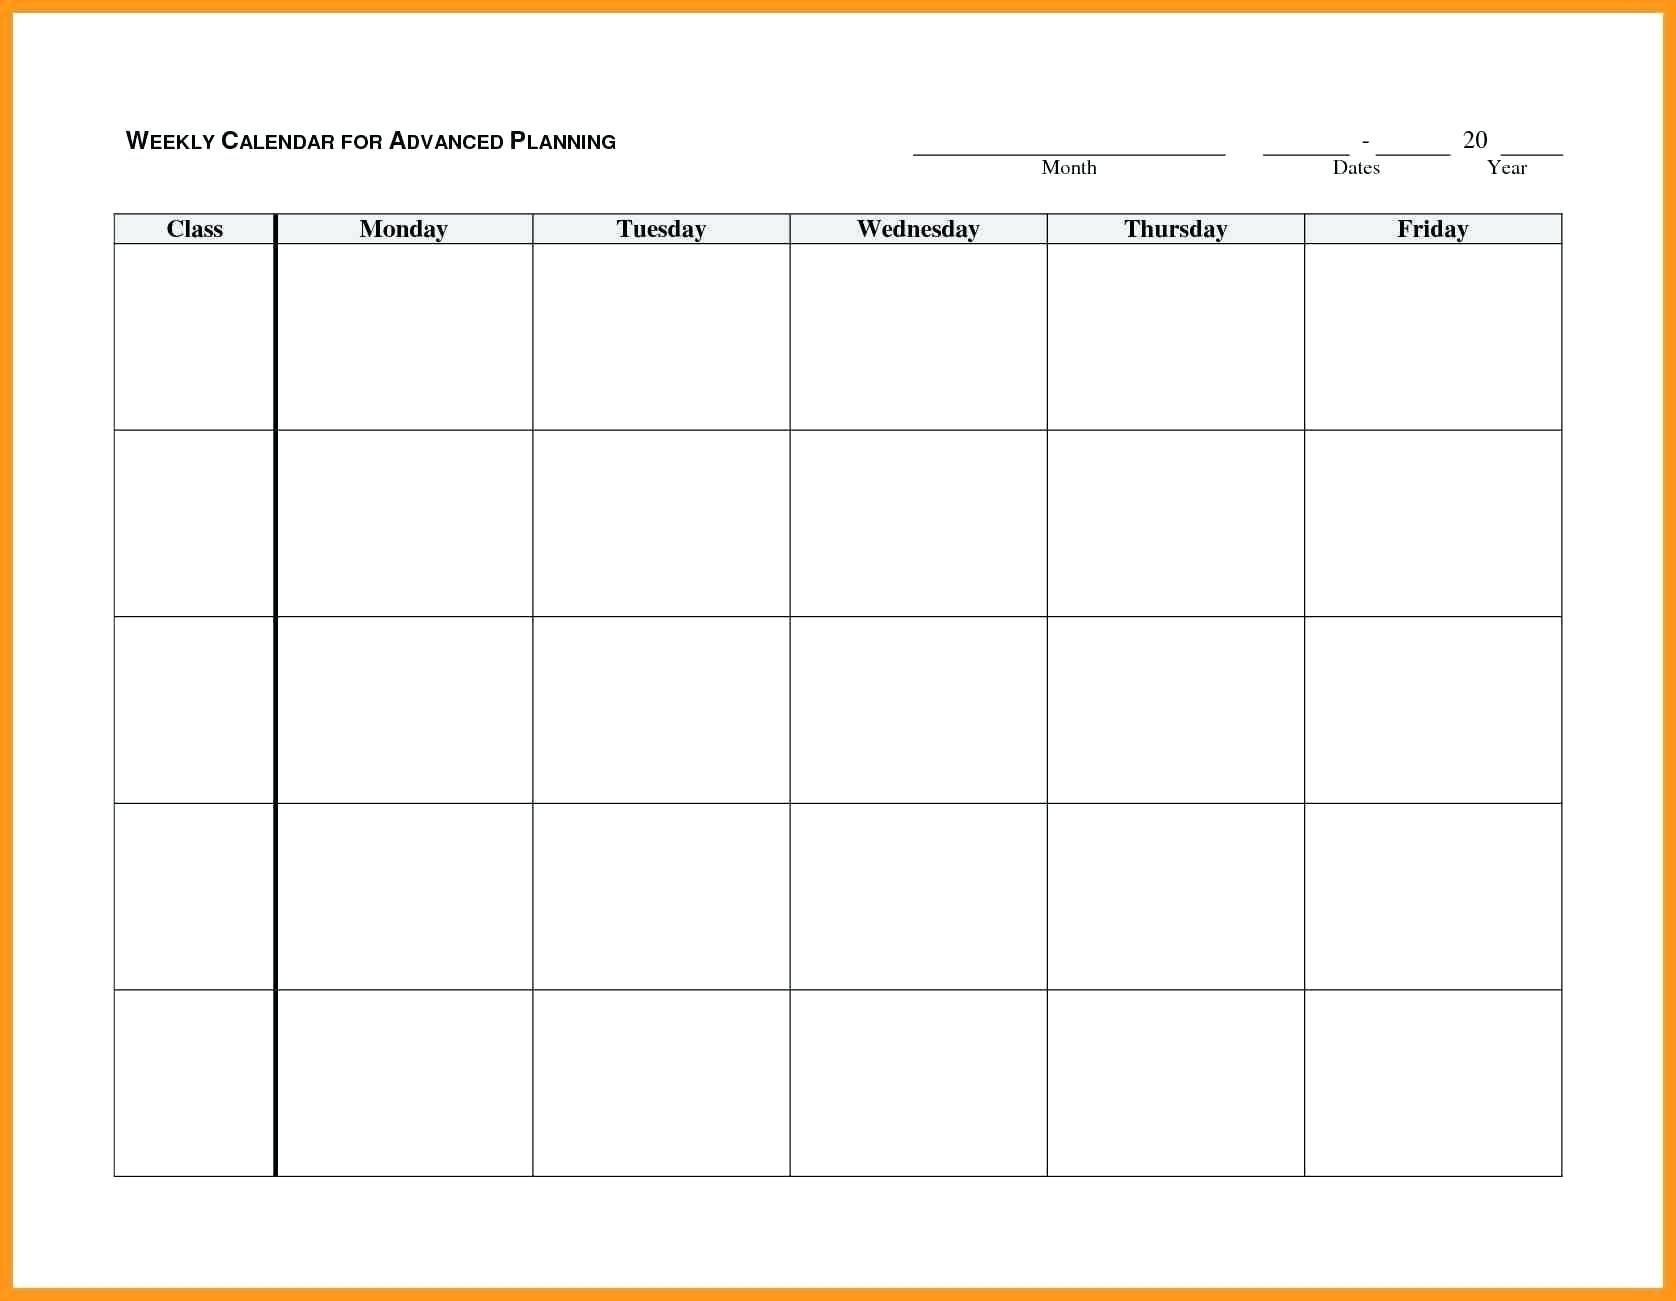 Monday To Friday Calendar Template   Example Calendar Mnday To Friday Calendar Templates